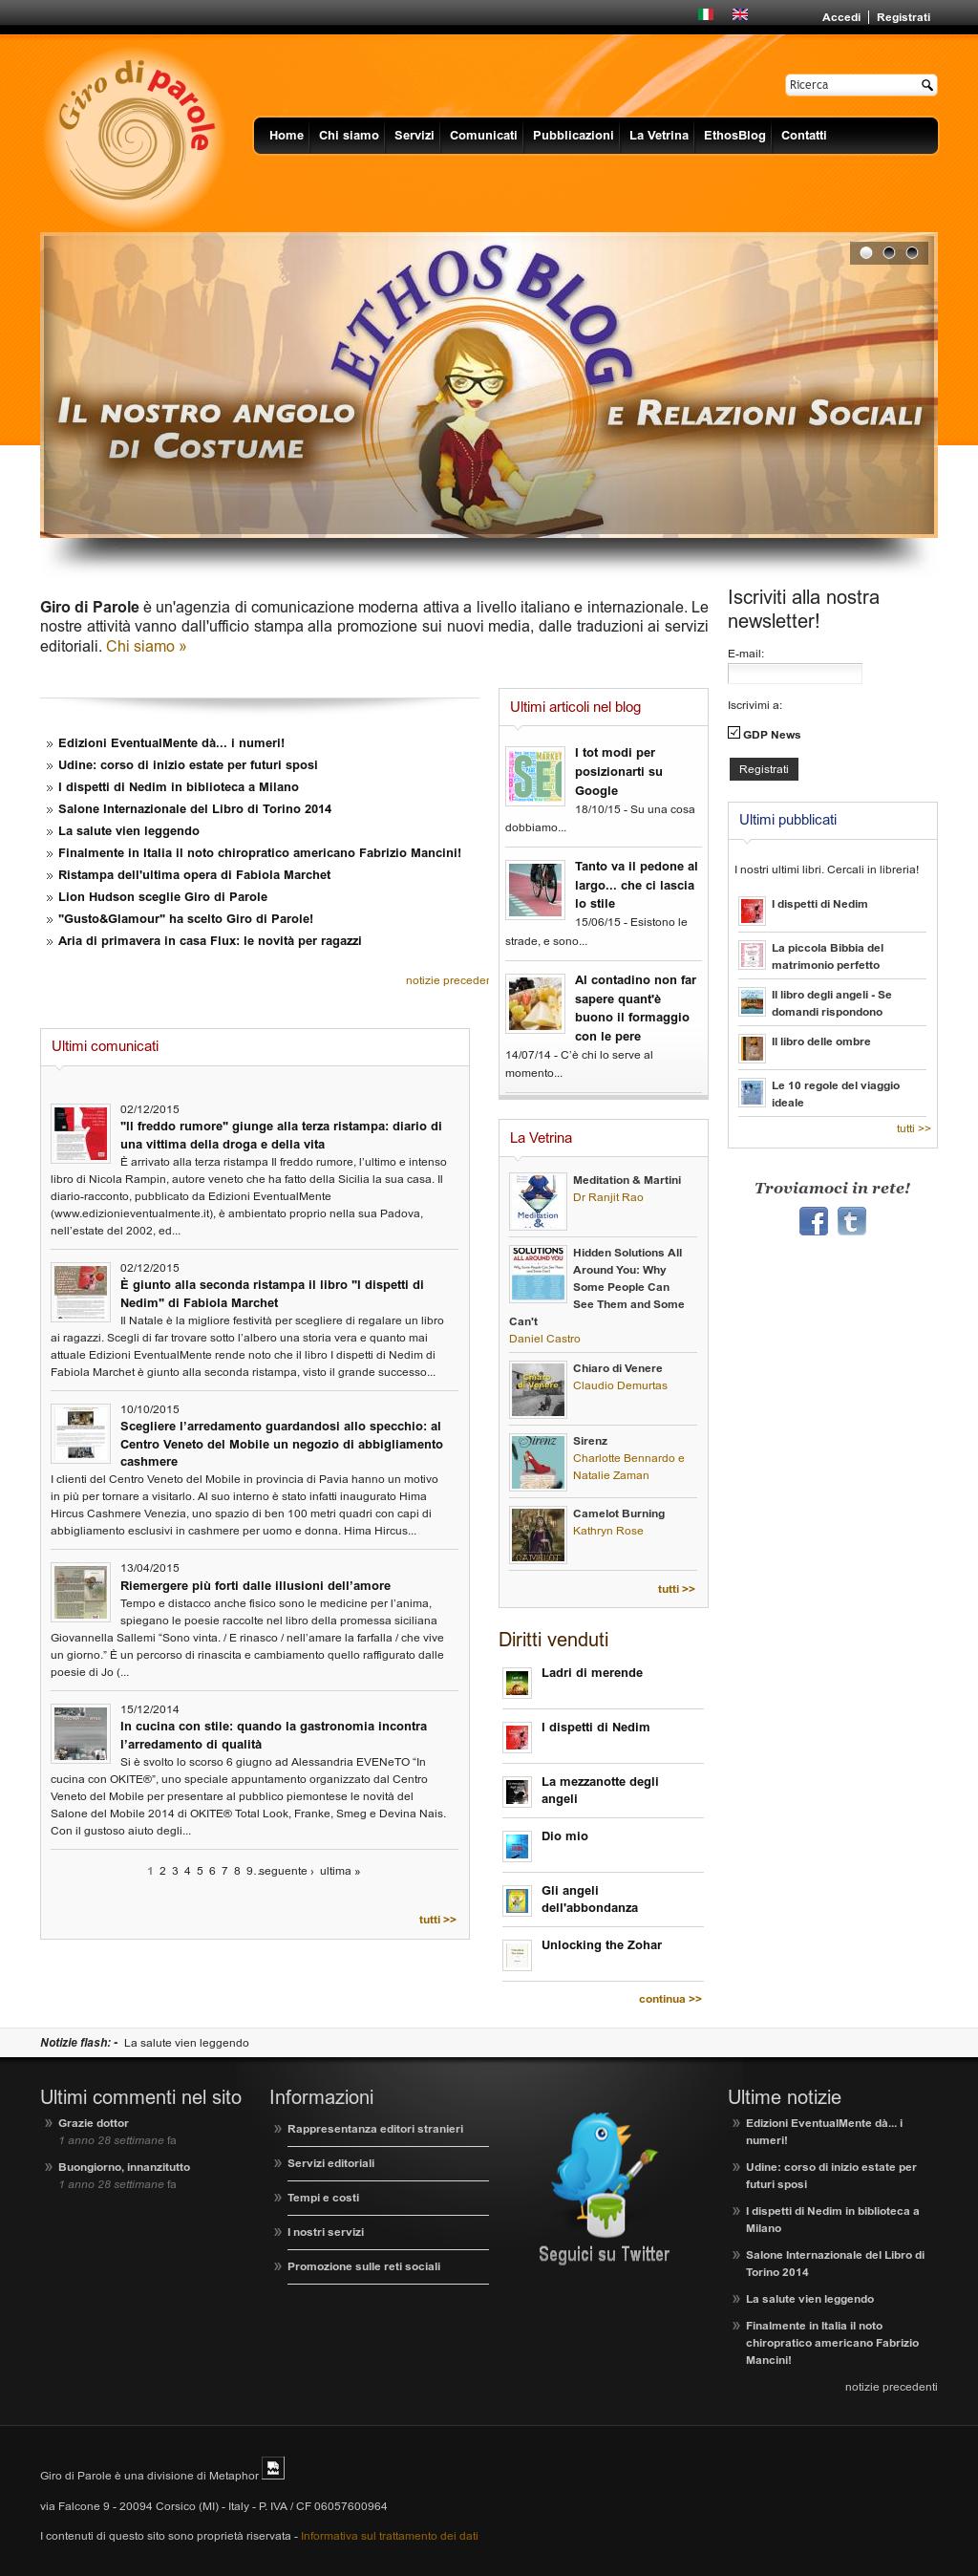 Awesome Veneta Arredi Alessandria Images - Lepicentre.info ...